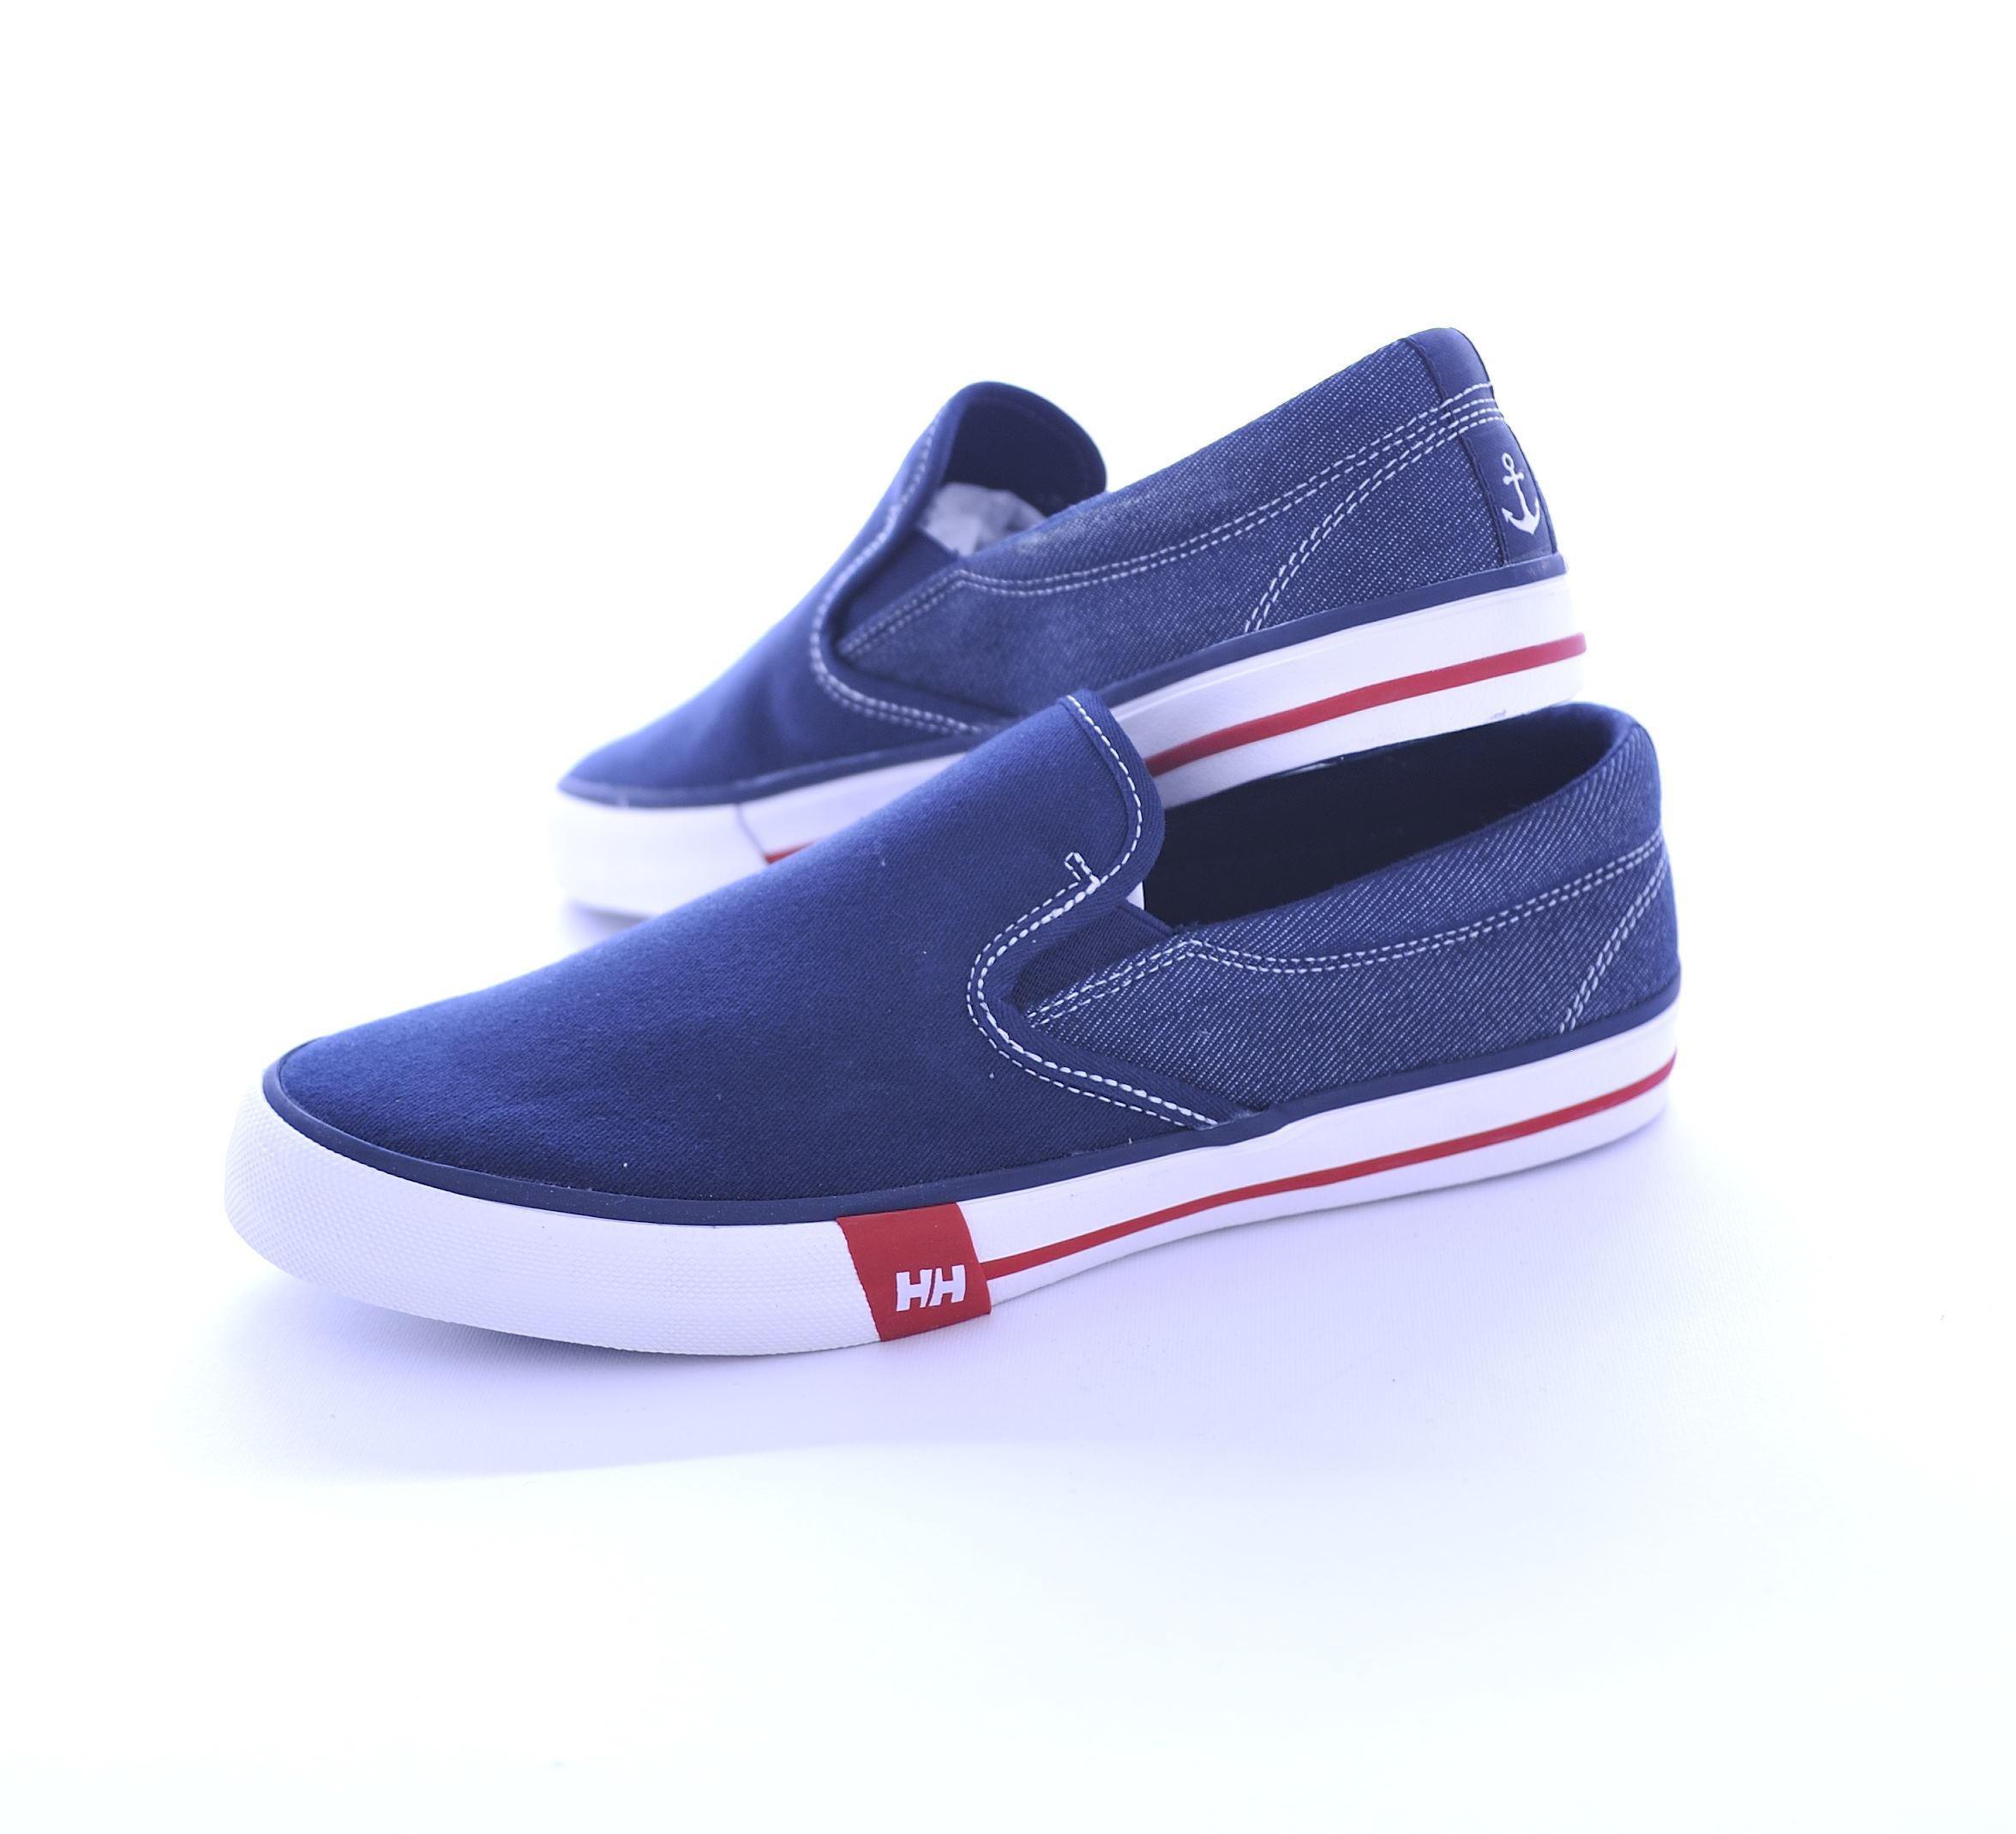 Picture of Copenhagen blue slip-on shoe